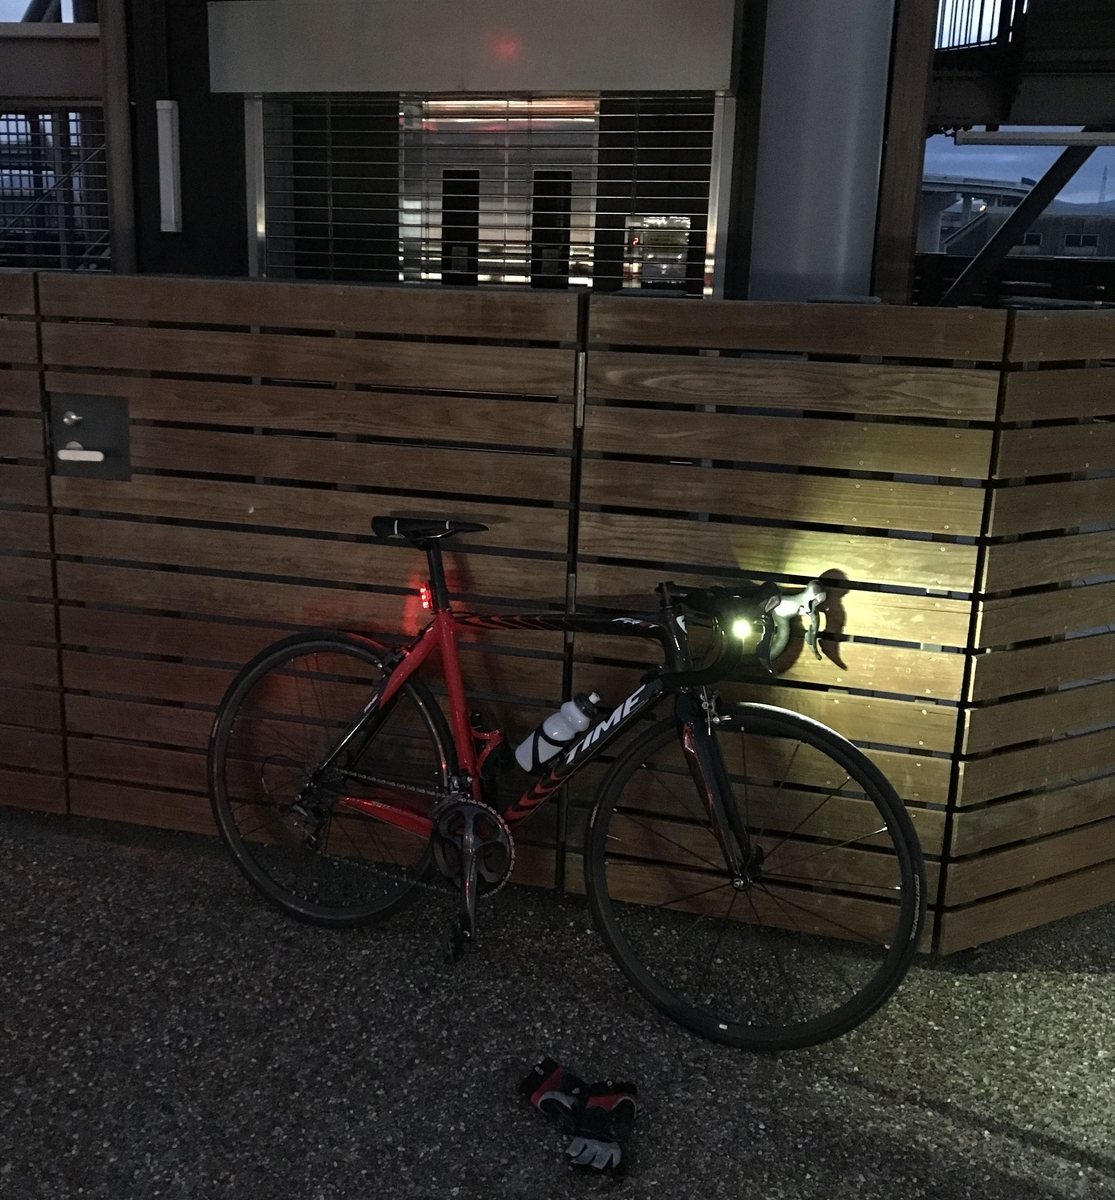 f:id:whitecollarcyclist:20210201150337j:plain